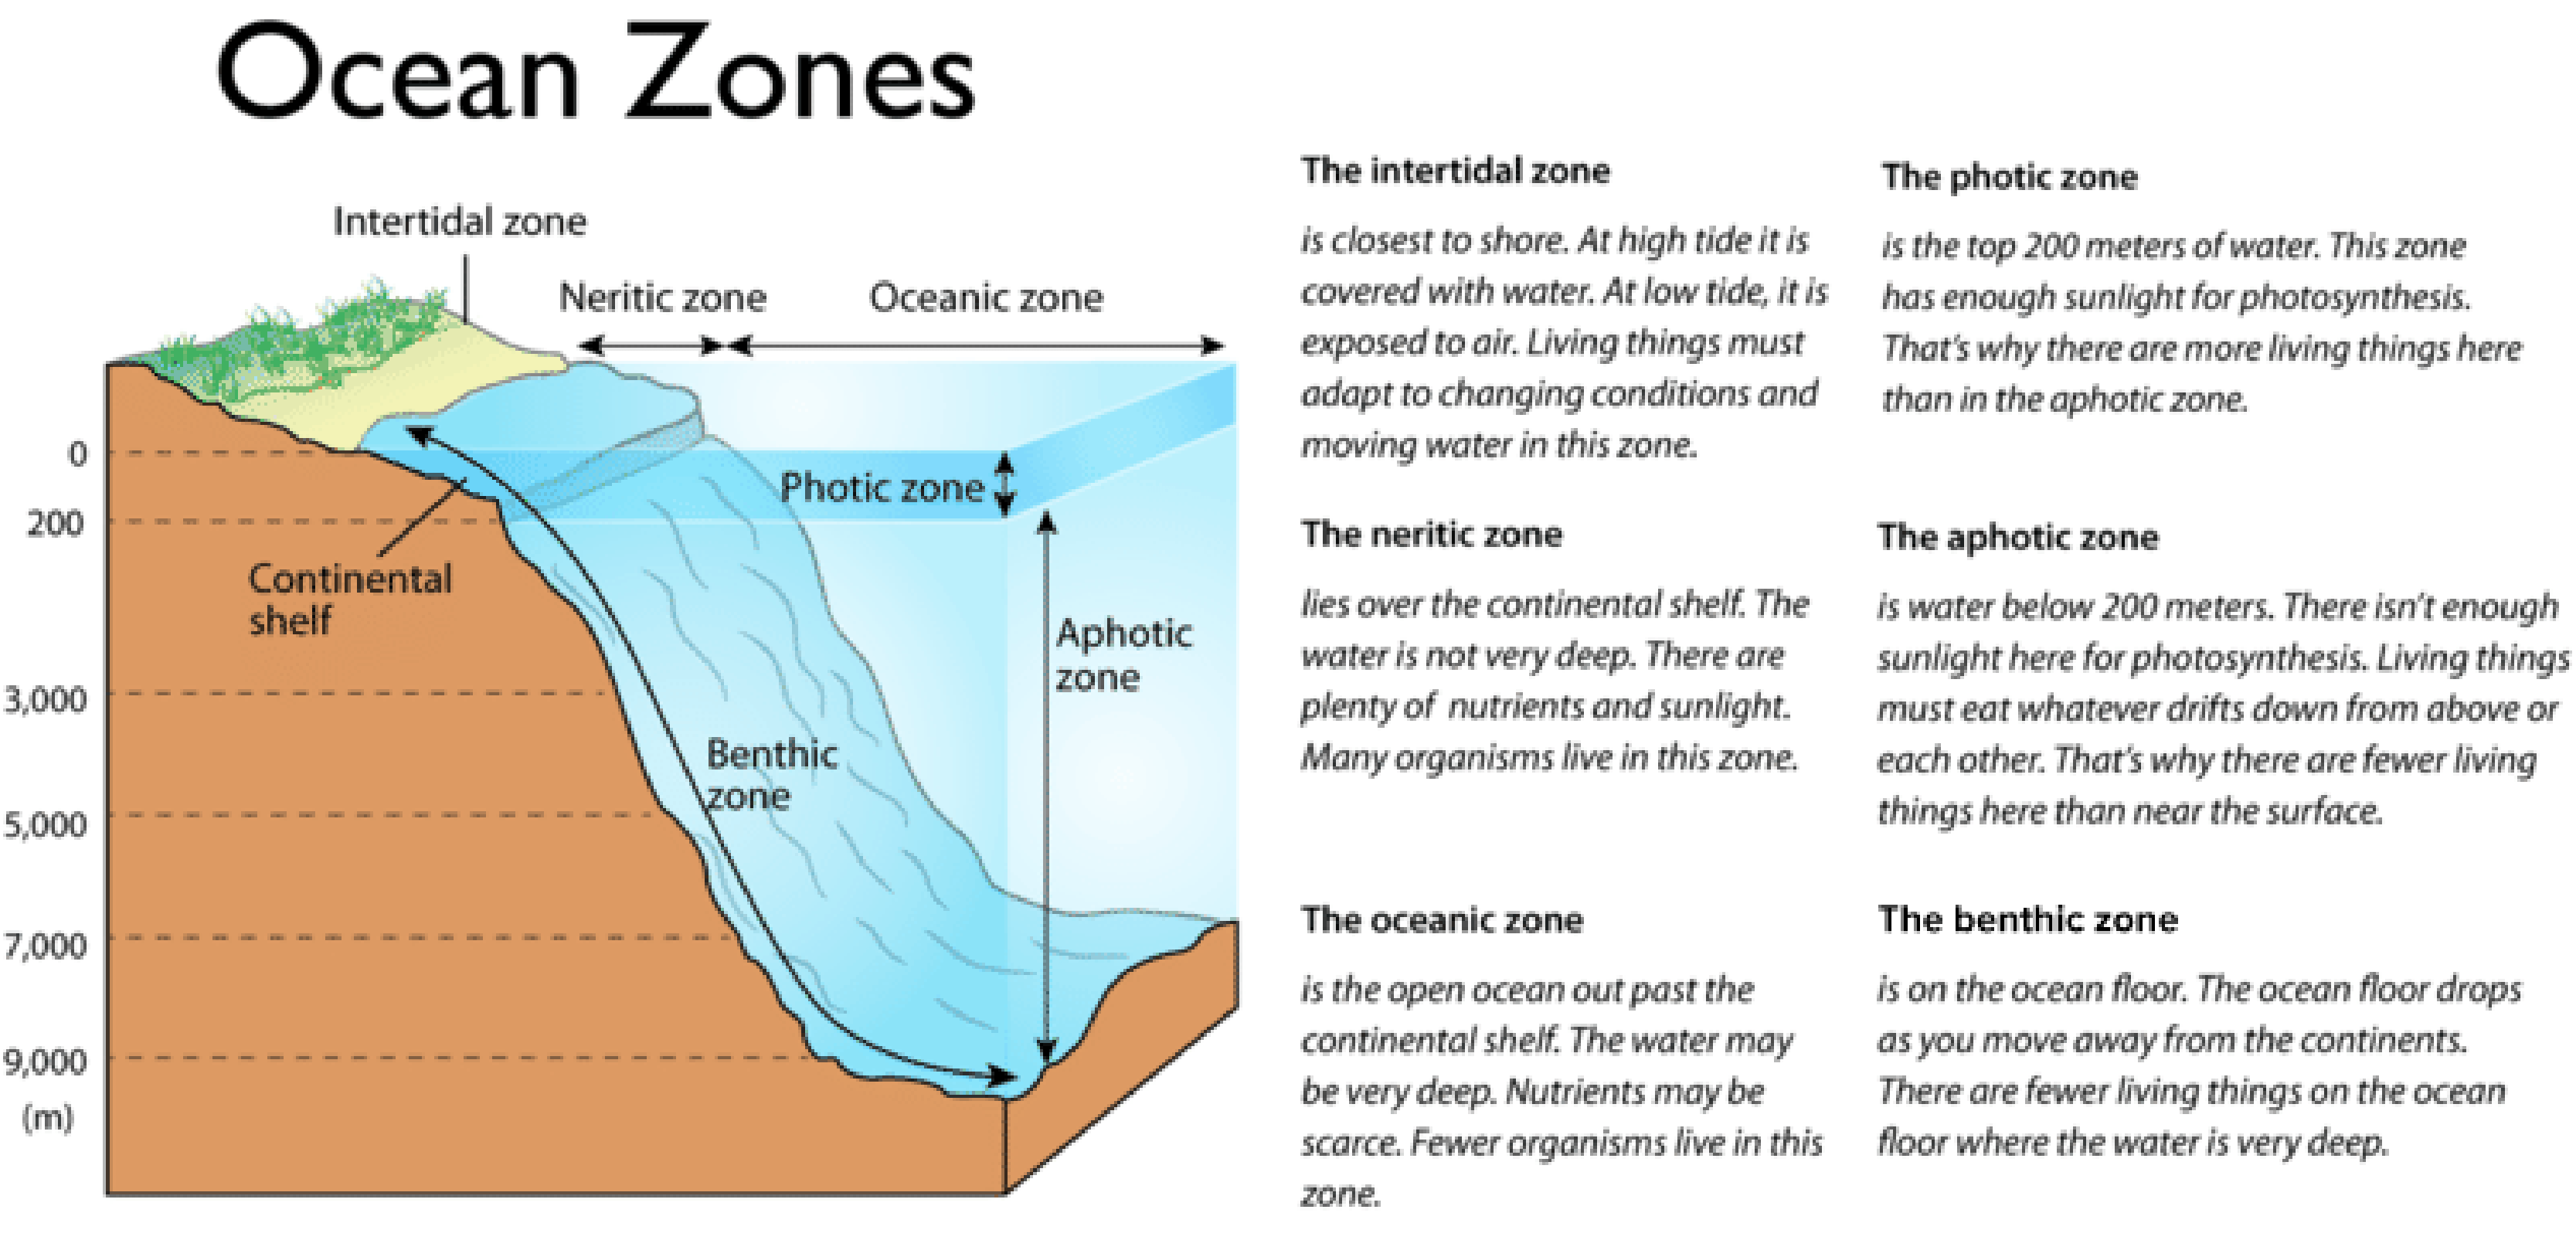 Diagram of the vertical and horizontal ocean zones